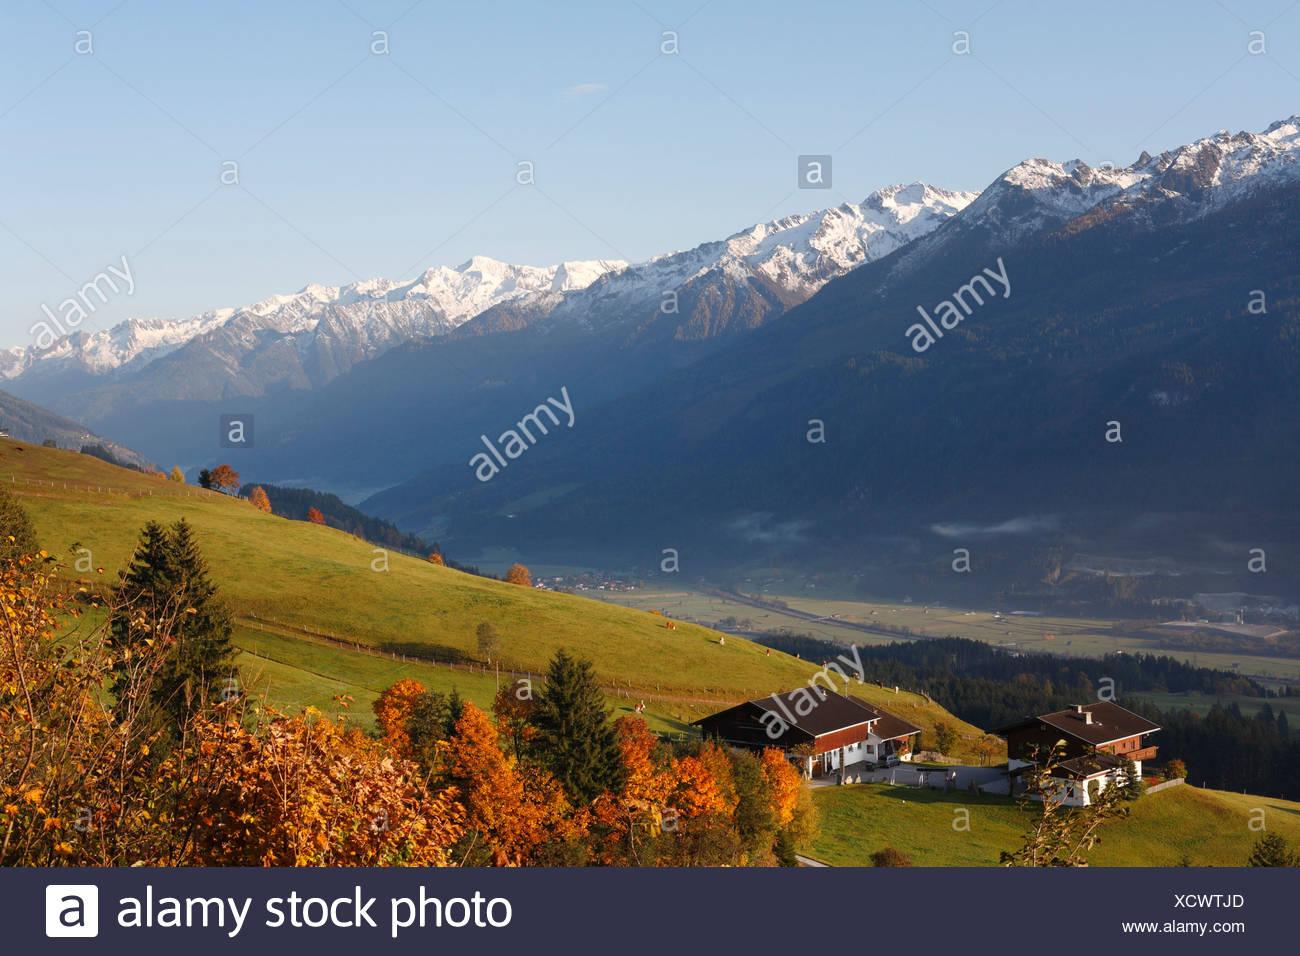 View from Passthurn over Pinzgau of Hohe Tauern Mountains, Salzburg, Austria, Europe Stock Photo